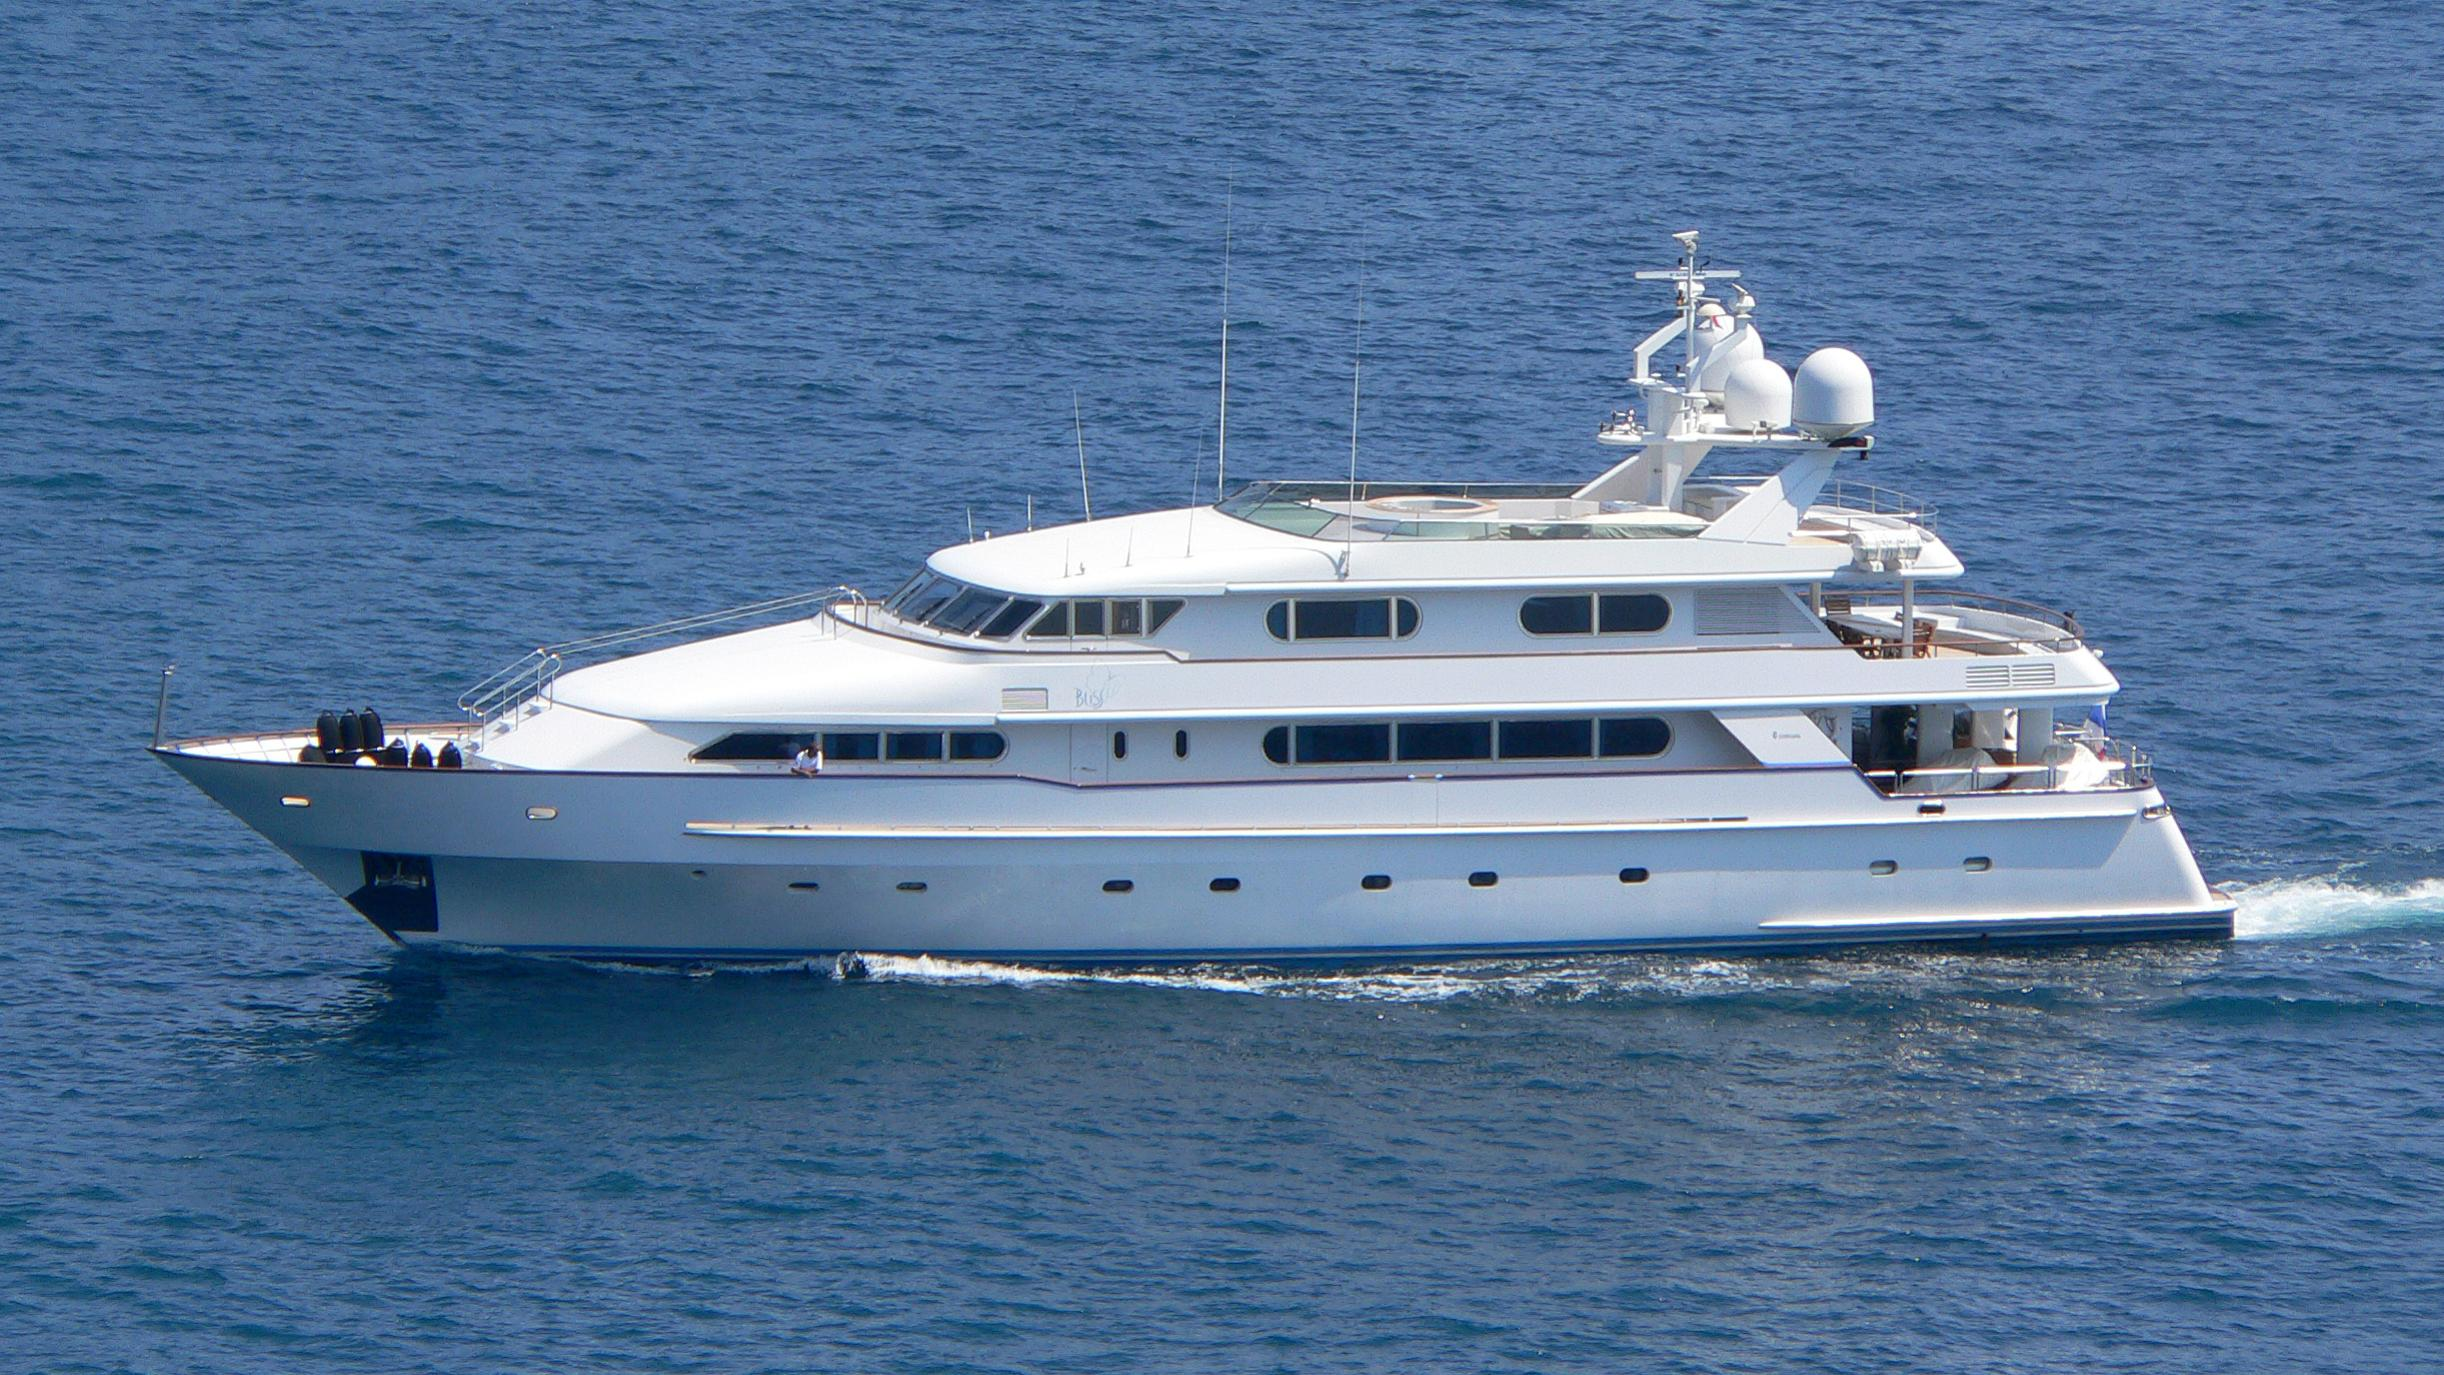 xana-ouranos-too-motor-yacht-codecasa-1994-40m-profile